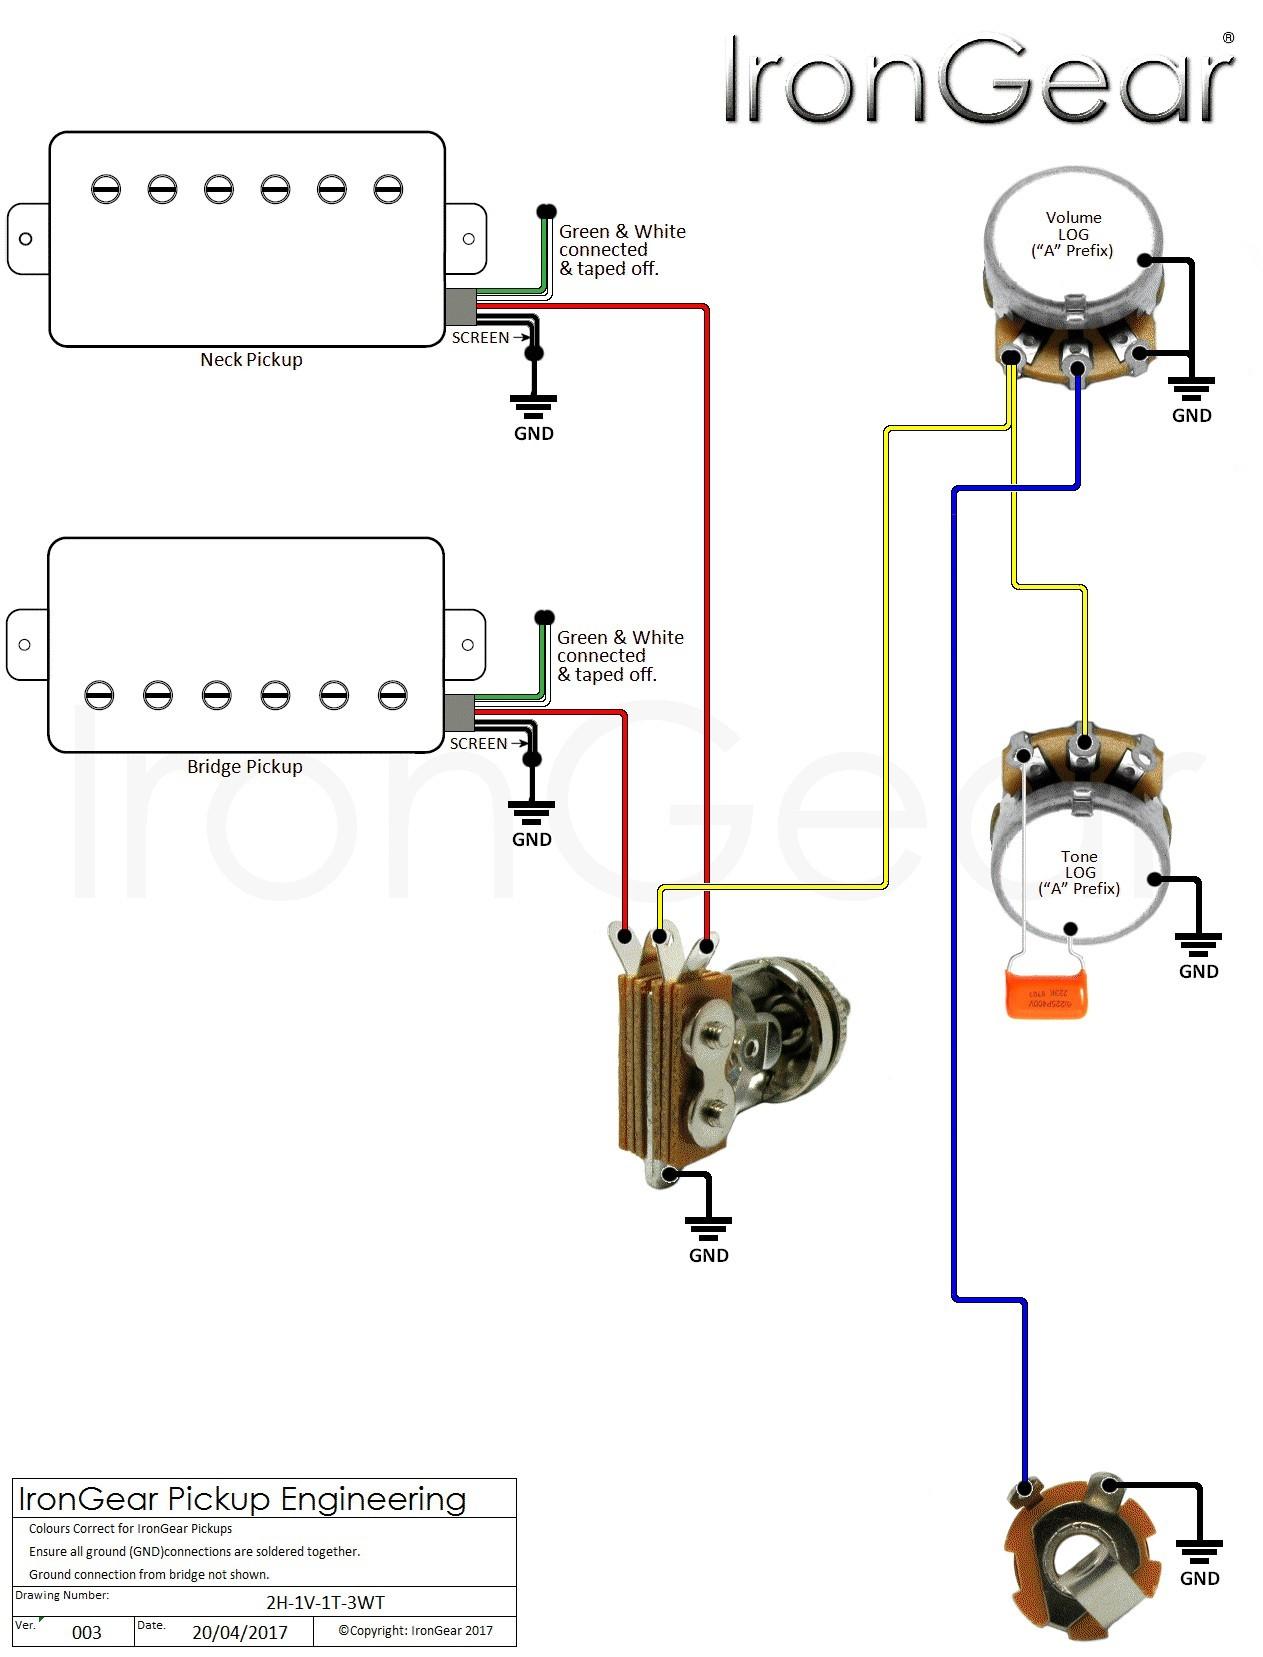 Electric Guitar Wiring Diagram e Pickup Inspirationa Guitar Wiring Diagrams 2 Pickups Wiring Diagram Database